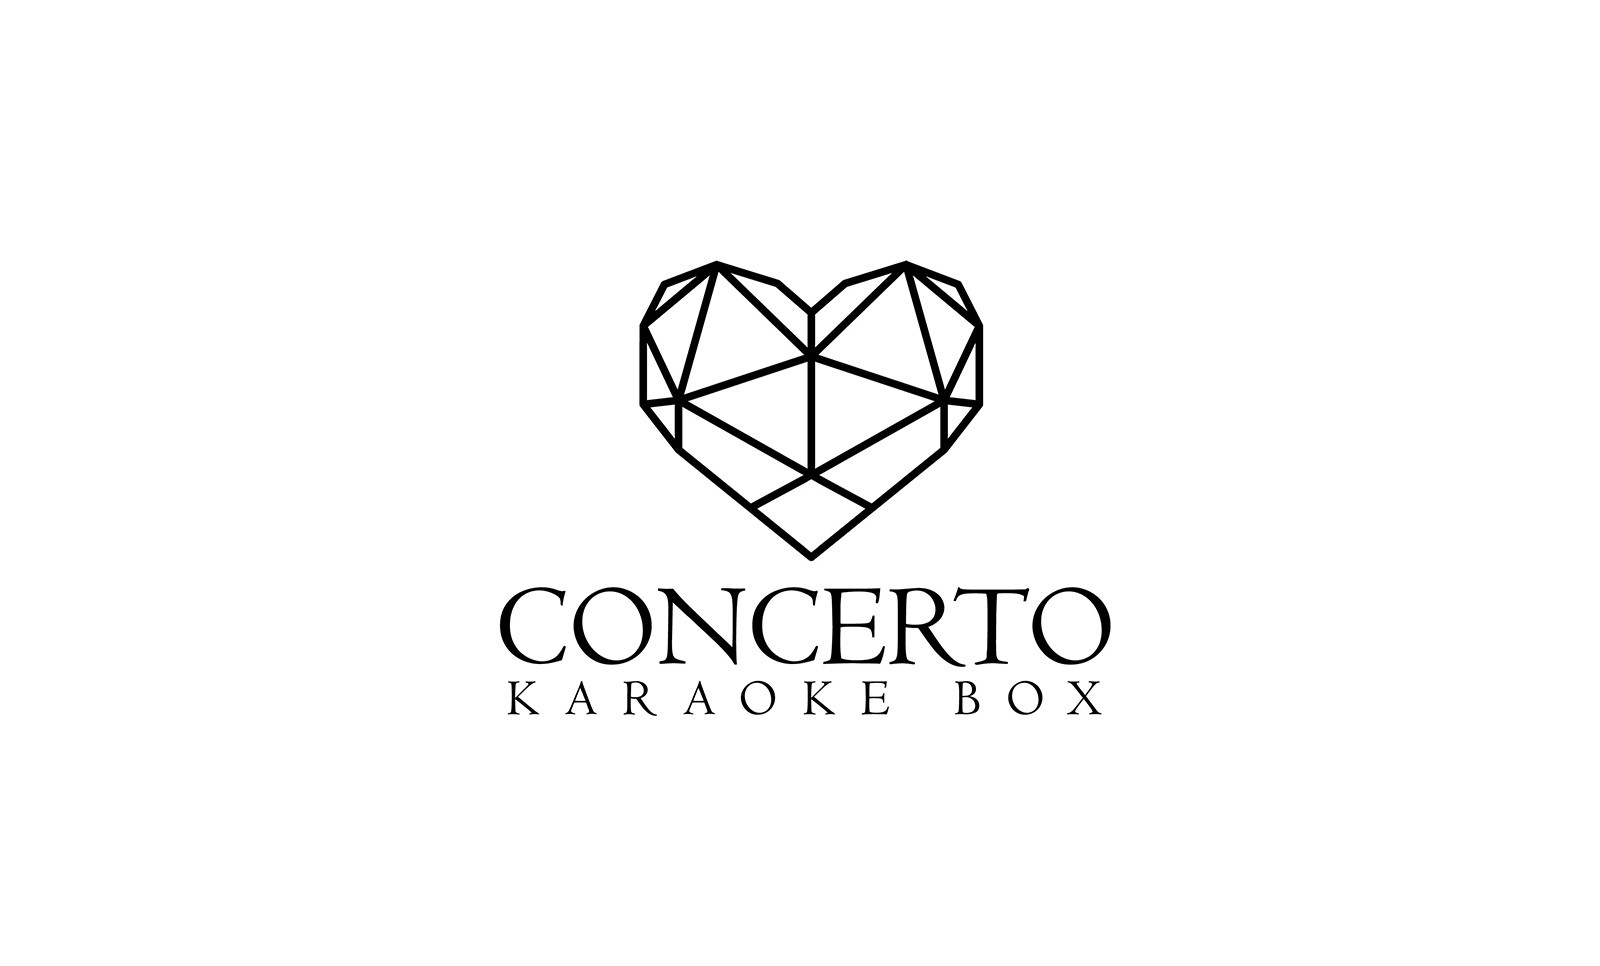 logo-concerto-karaoke-box